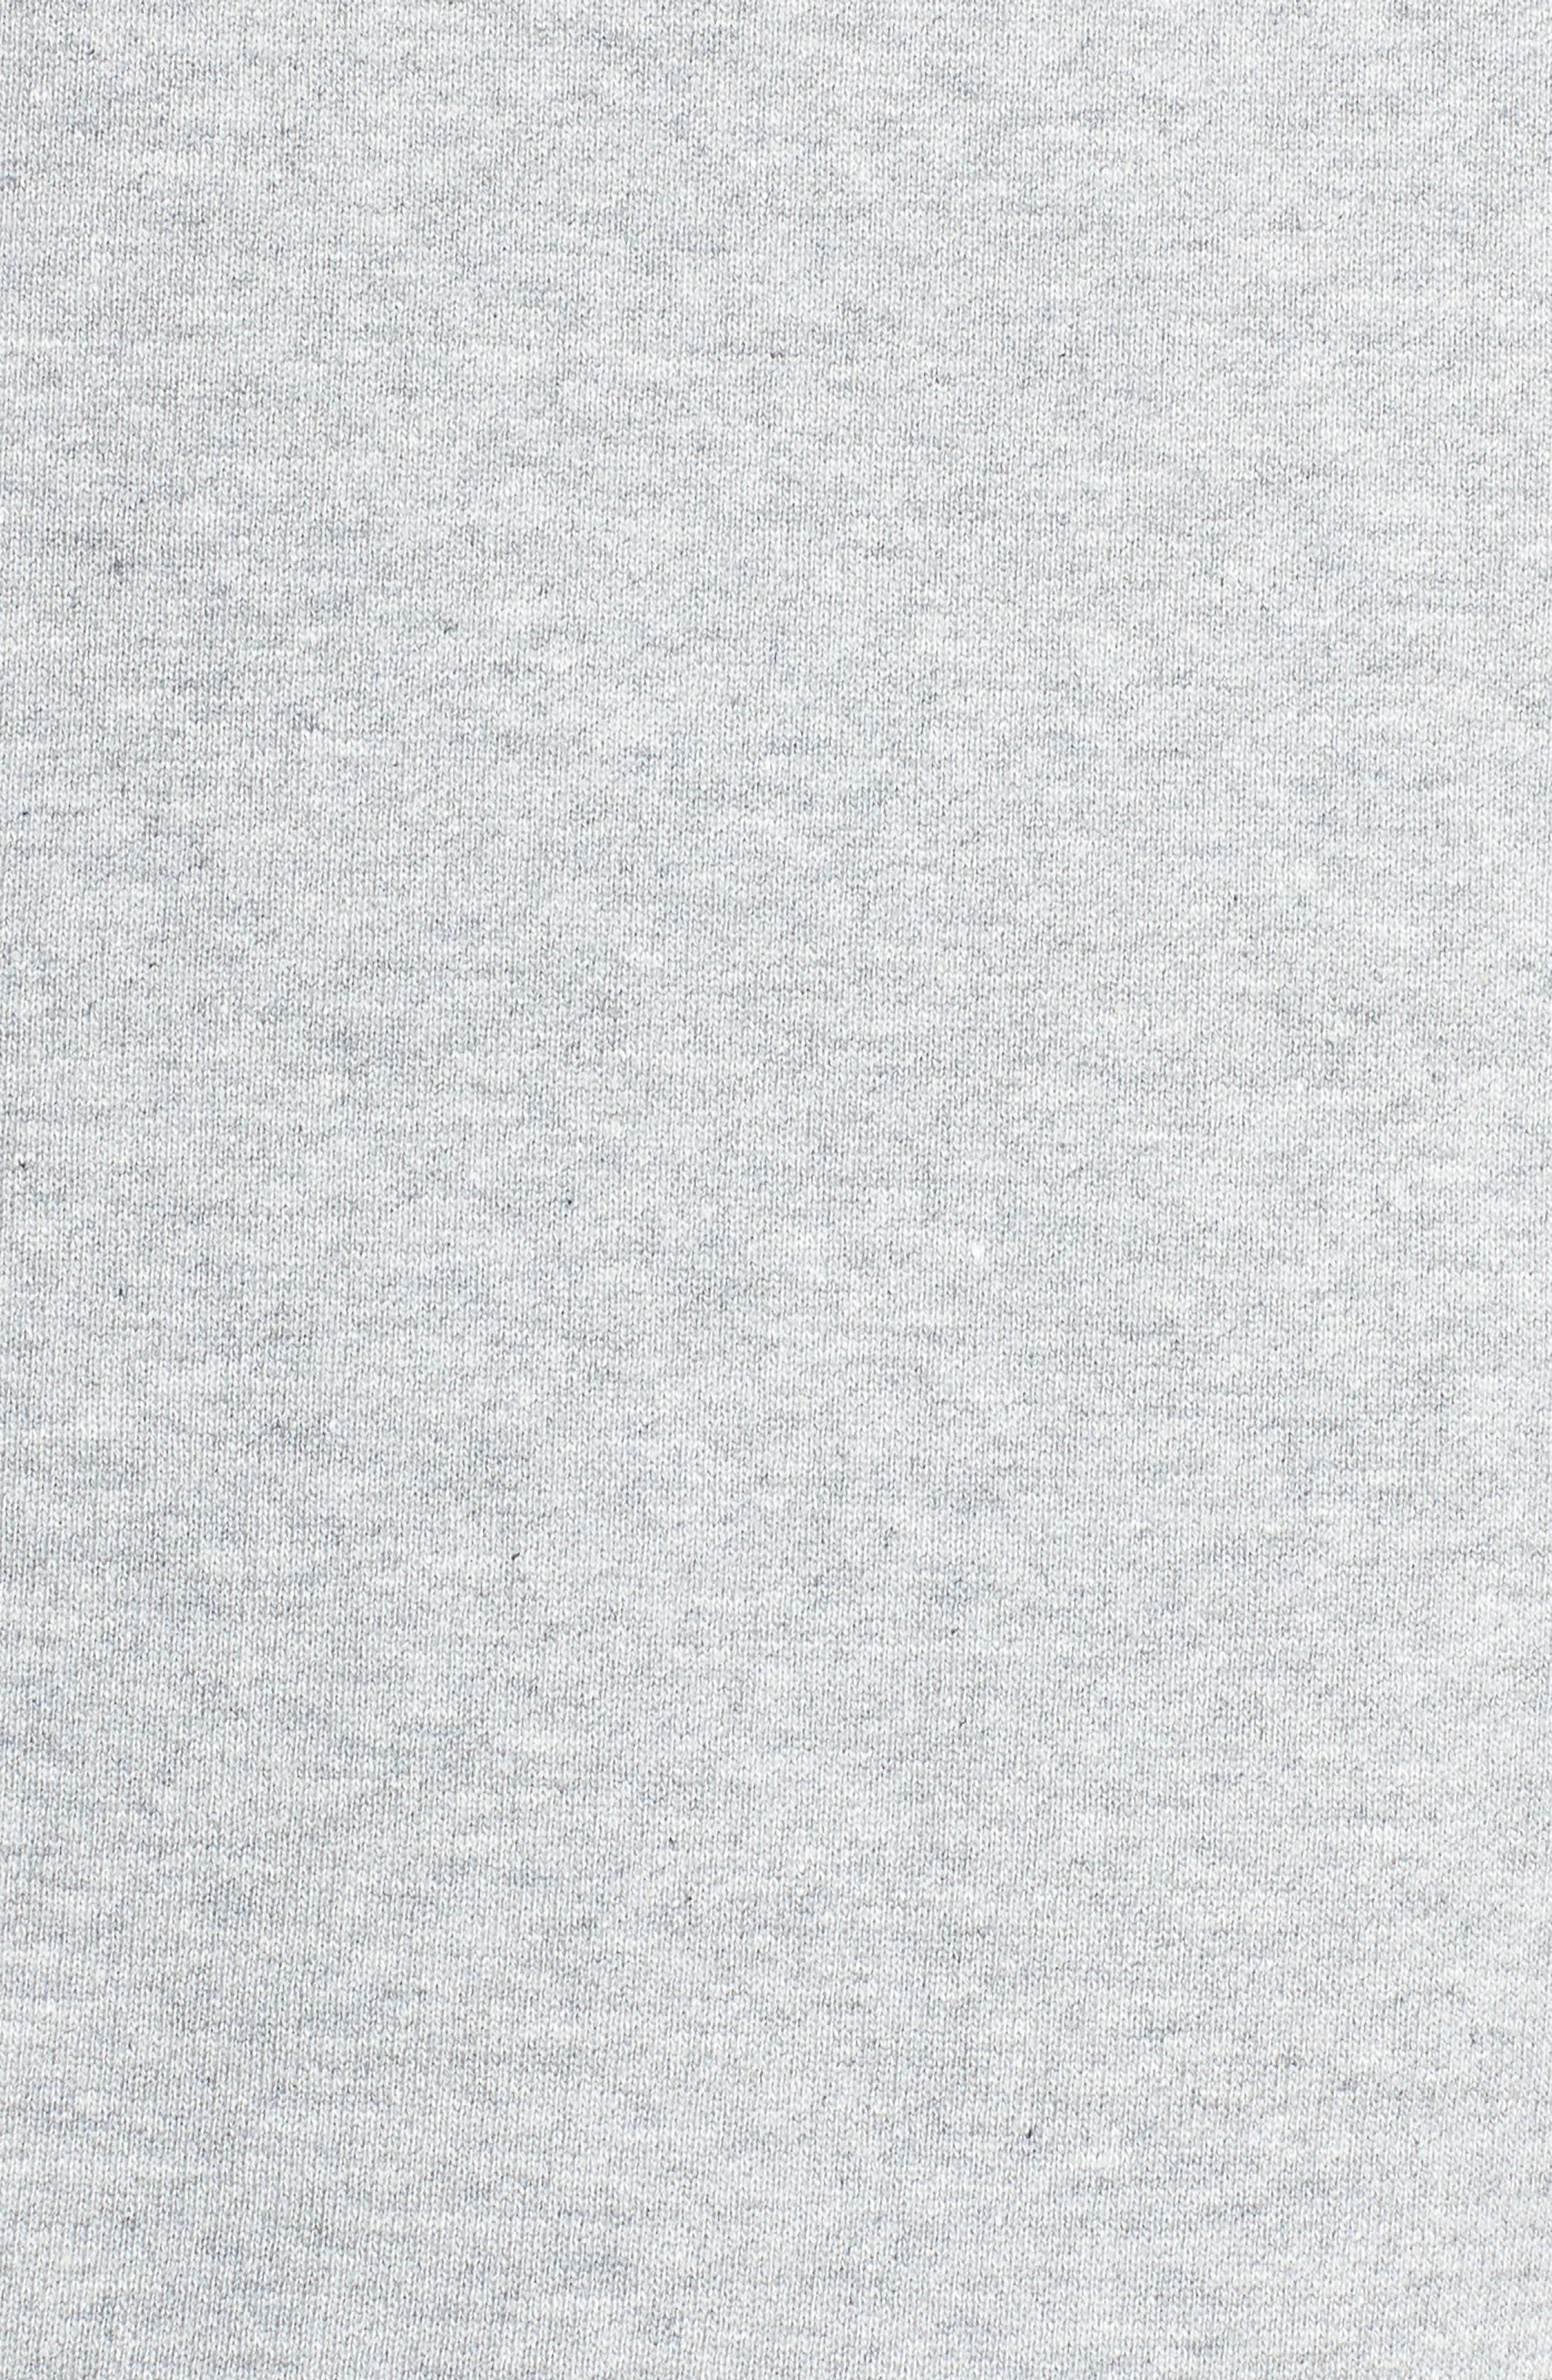 NIKE, Sportswear Logo Oversize Sweatshirt, Alternate thumbnail 6, color, DARK GREY HEATHER